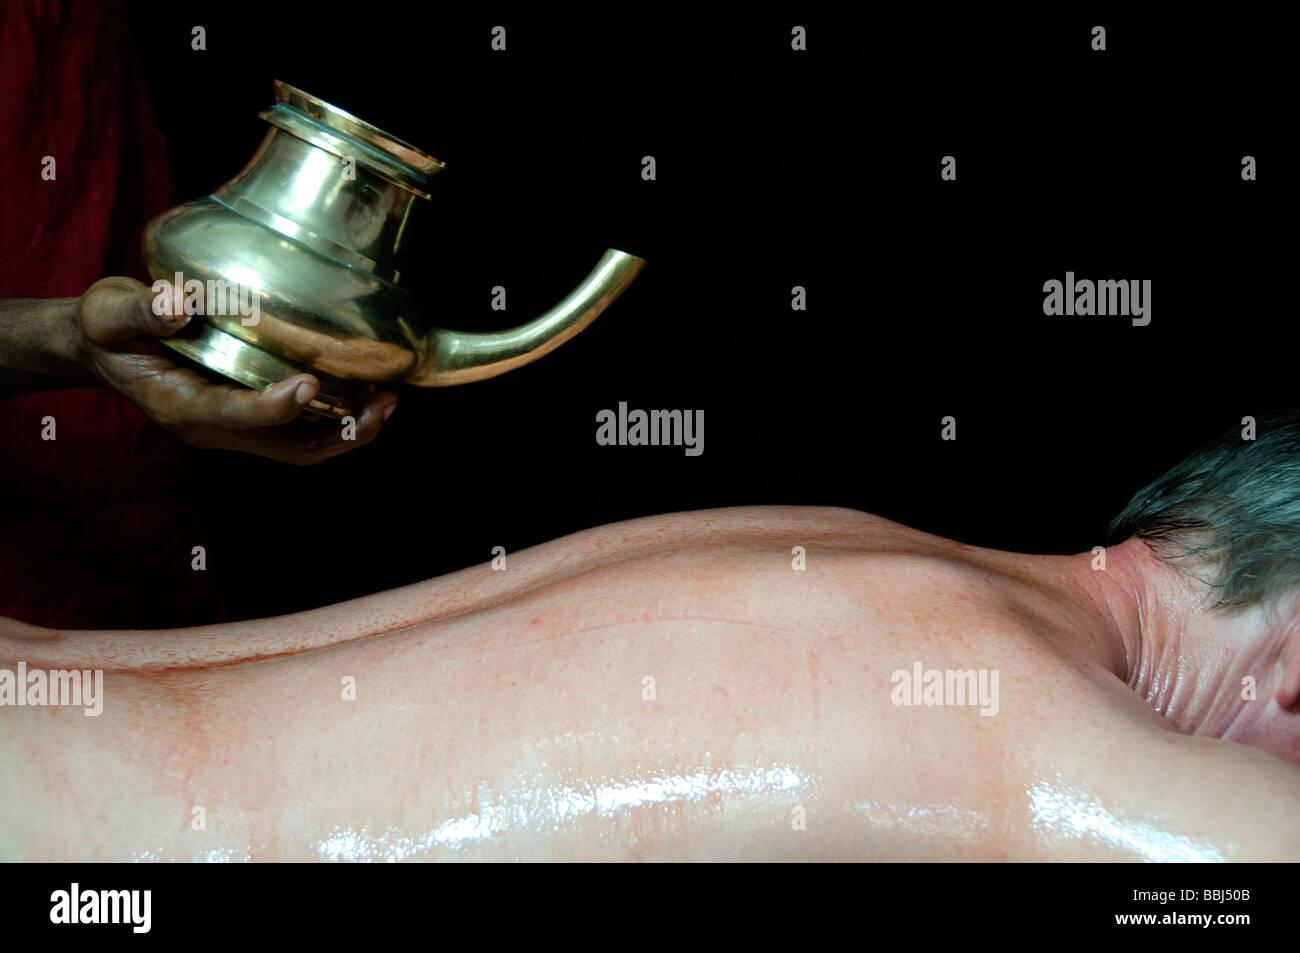 Young Man receiving an Ayurveda therapy, Ayurvedic massage treatment kerala India - Stock Image